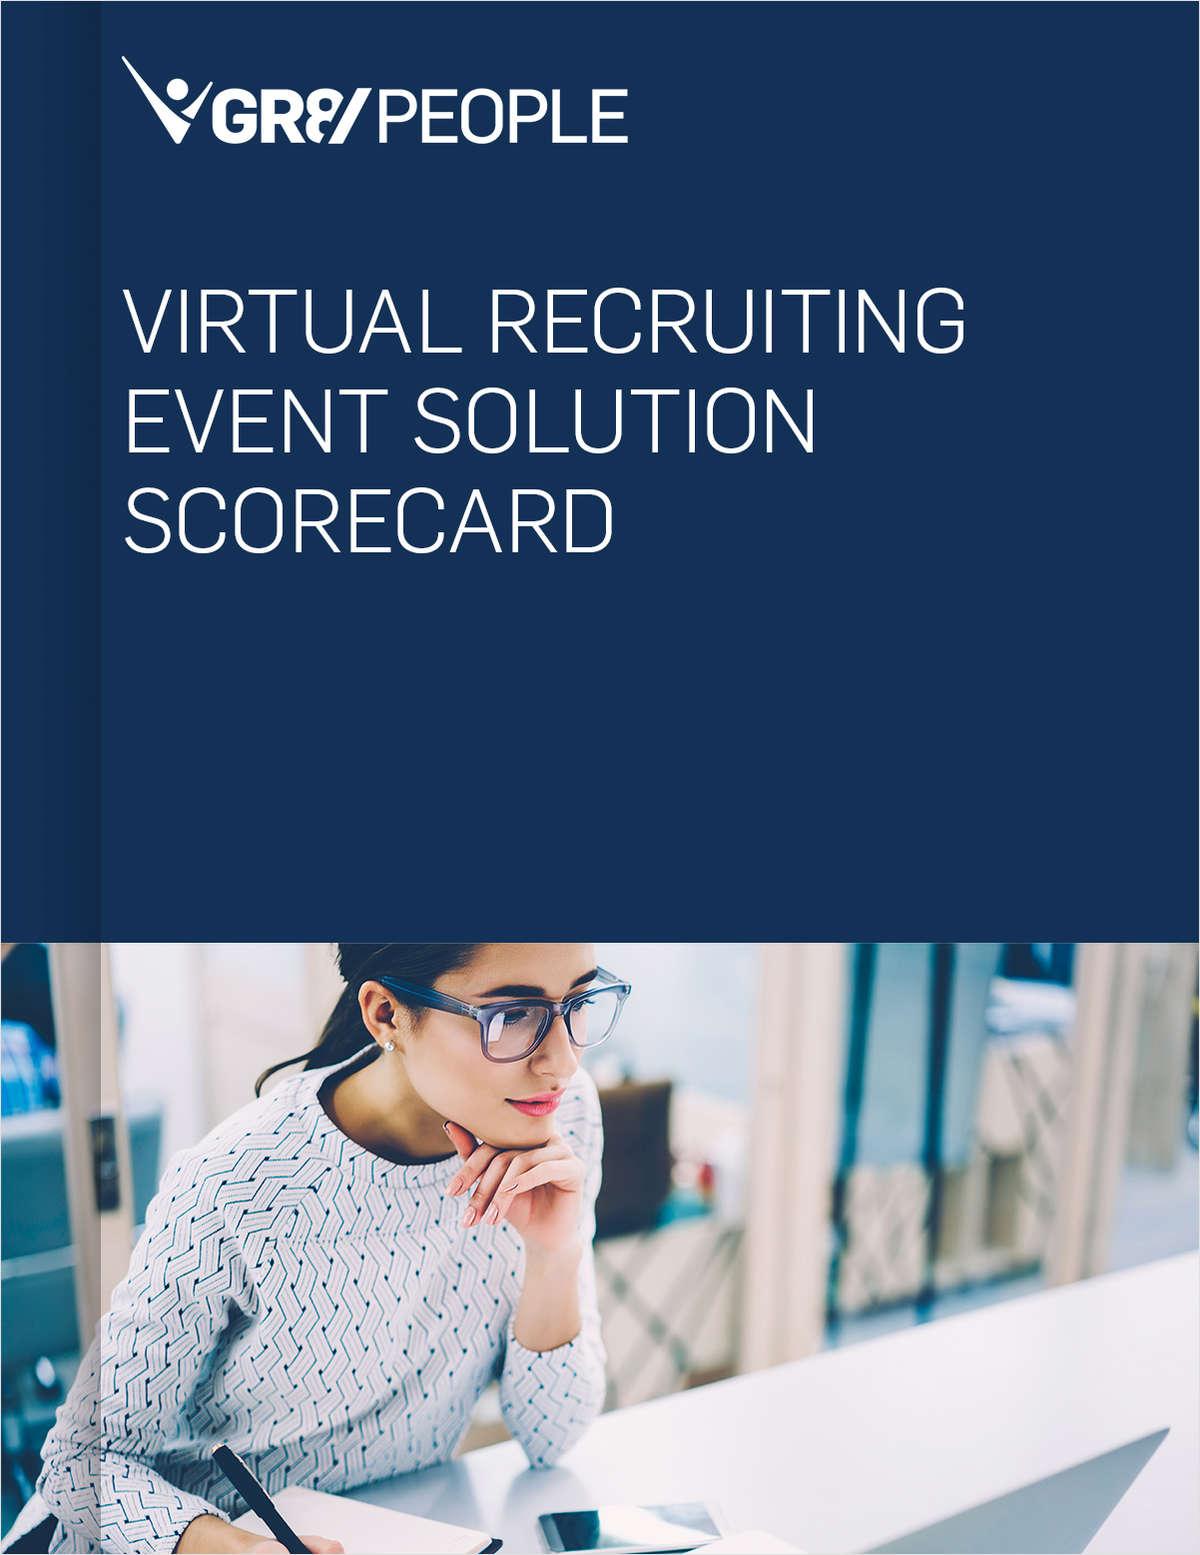 Virtual Recruiting Event Solution Scorecard